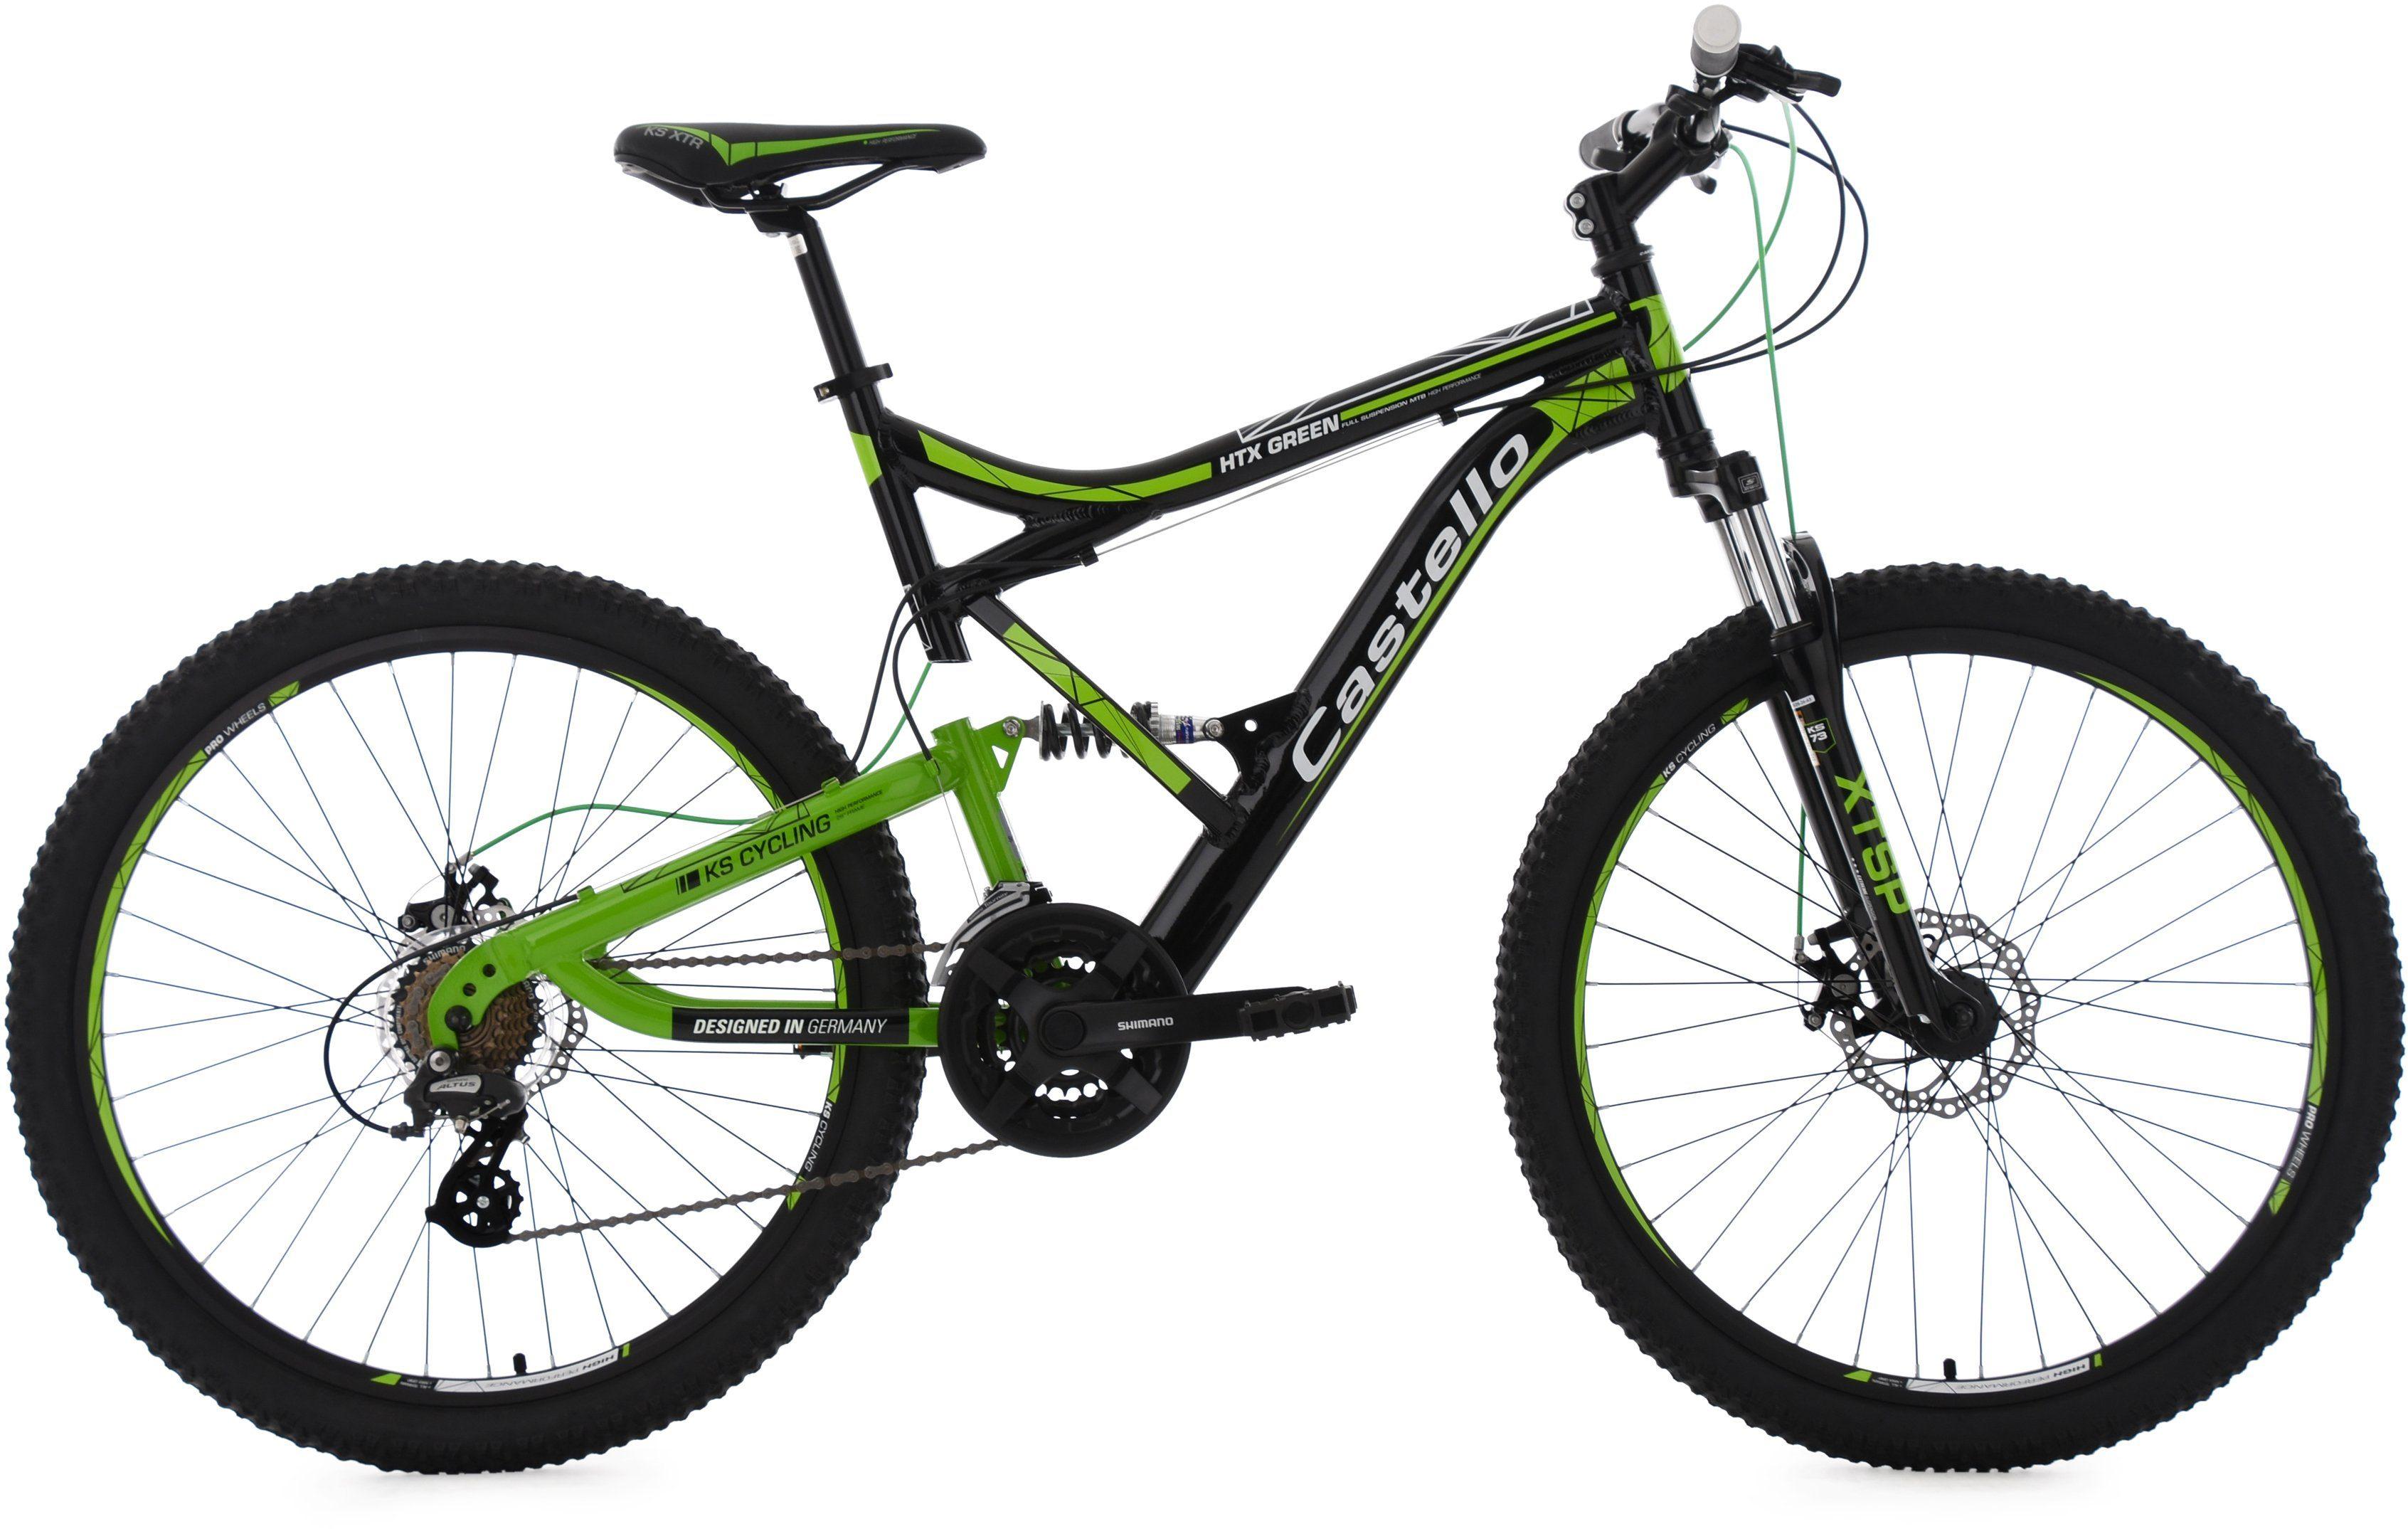 KS Cycling Herren Fully-MTB,26 Zoll,21 Gg-Shimano Tourney Kettensch, schwarz-grün, »Castello HTX«